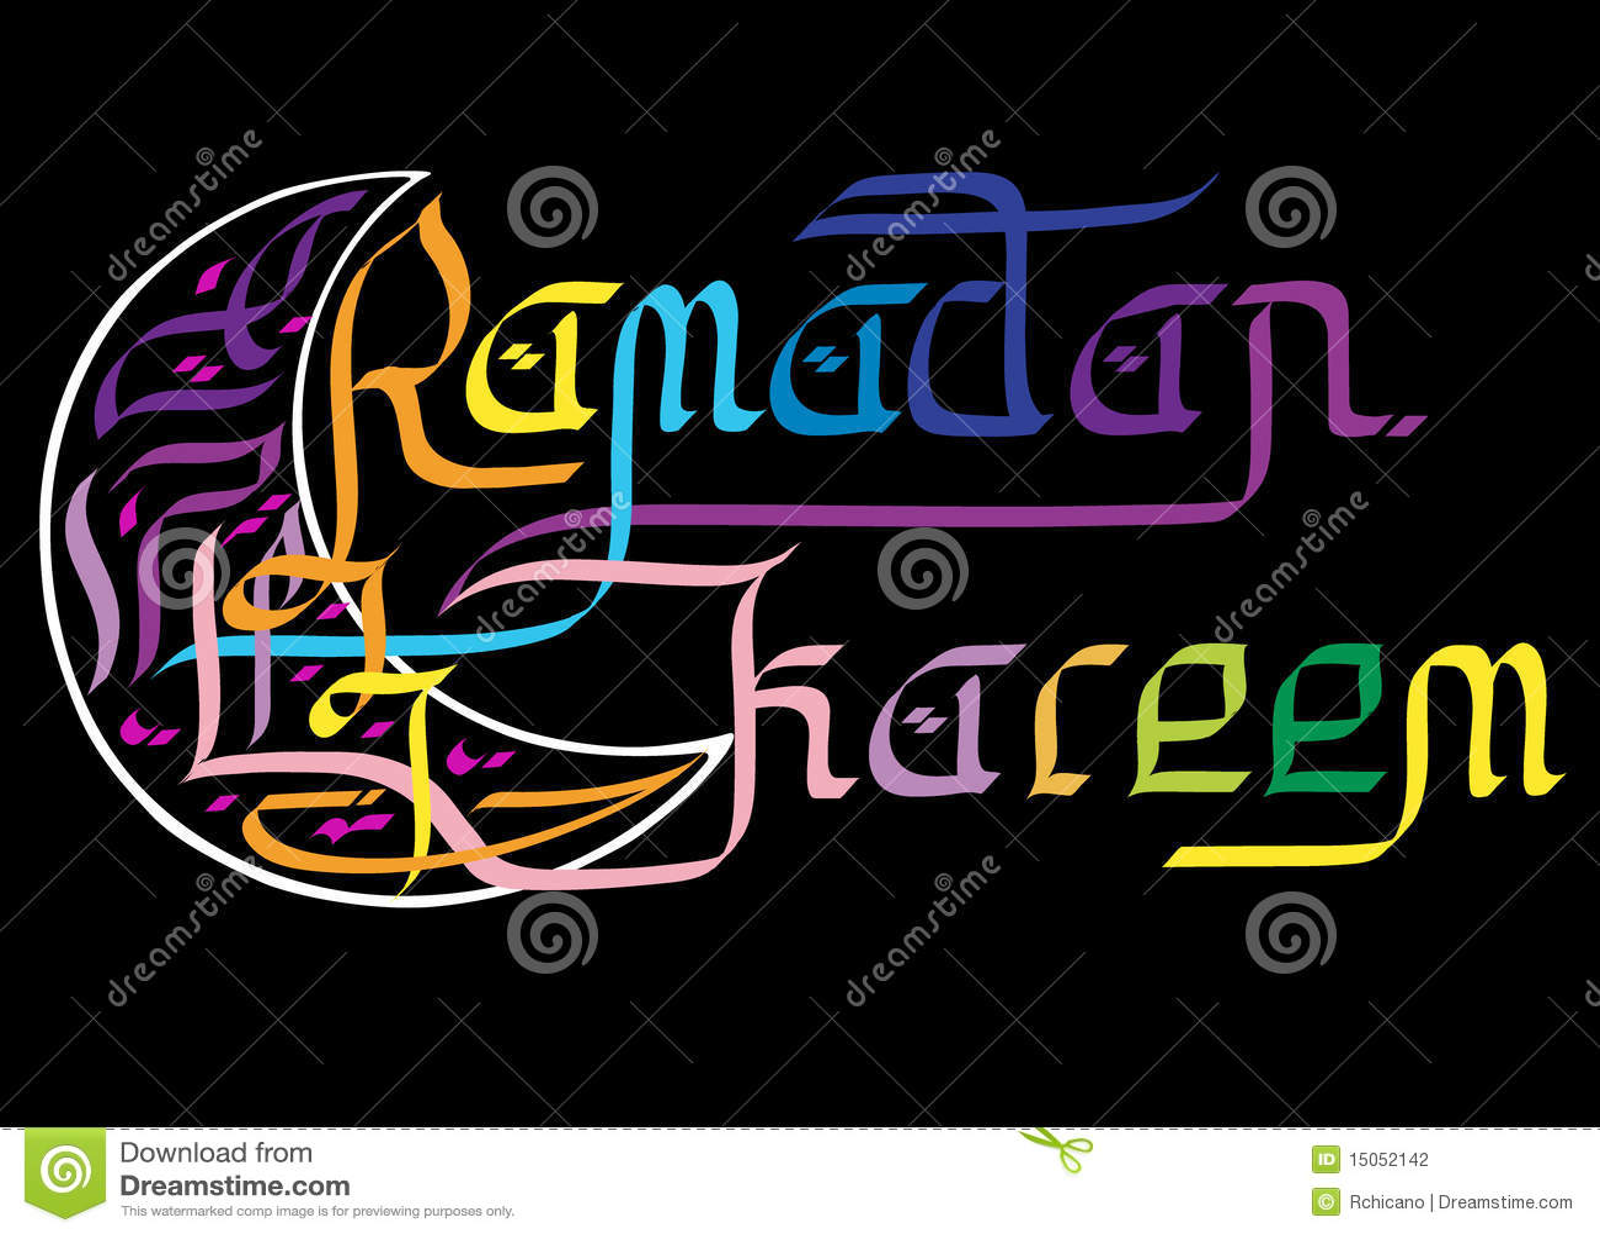 Stylish Ramadan Greetings